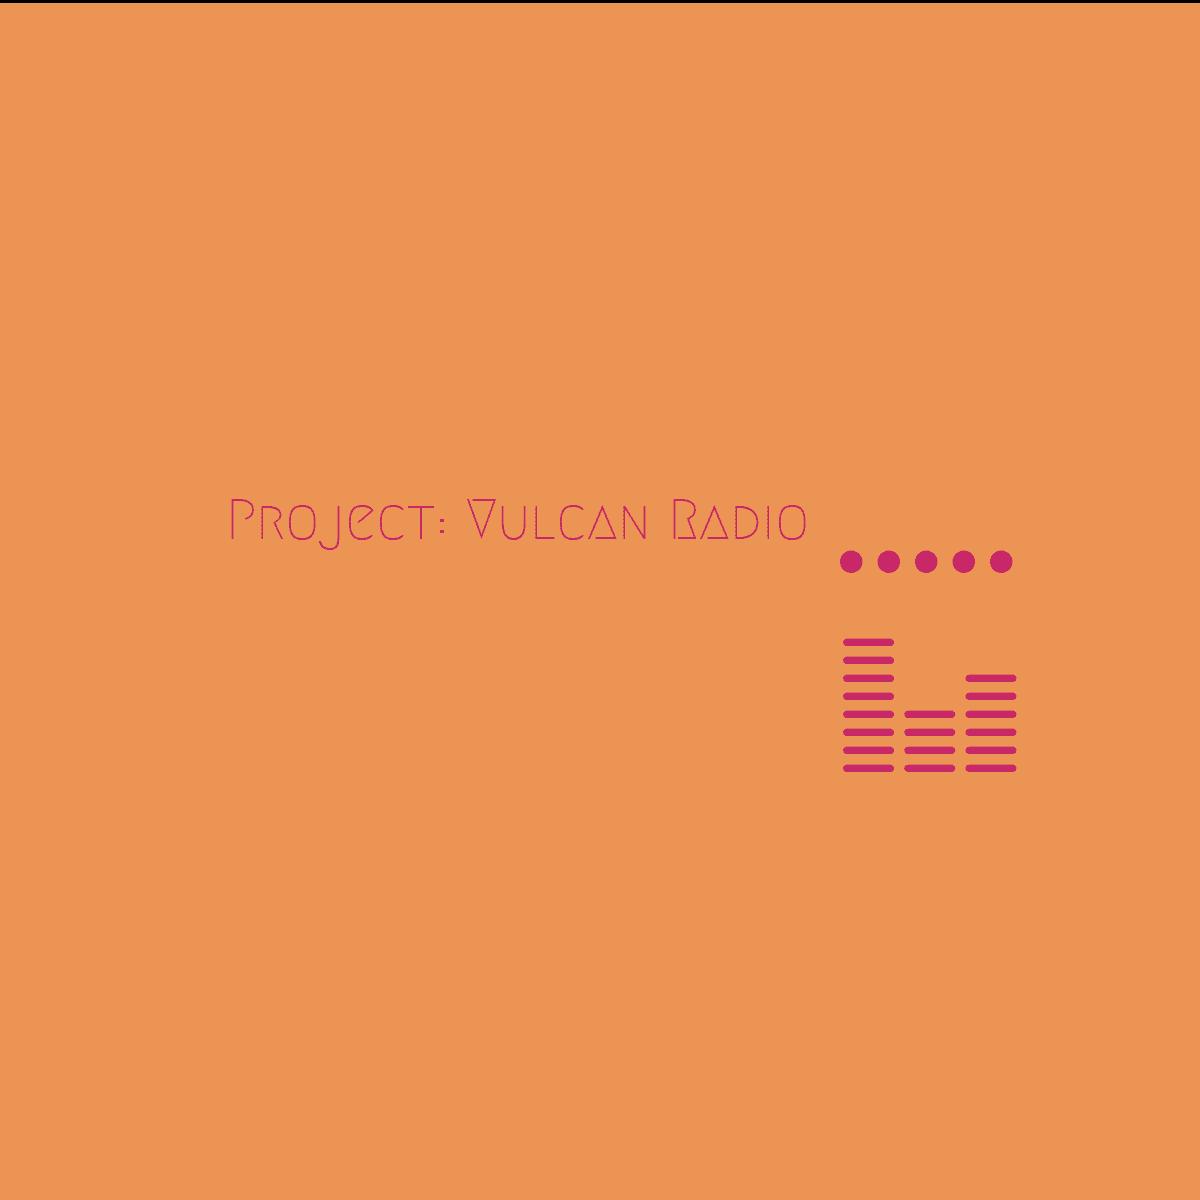 Project Vulcan Radio